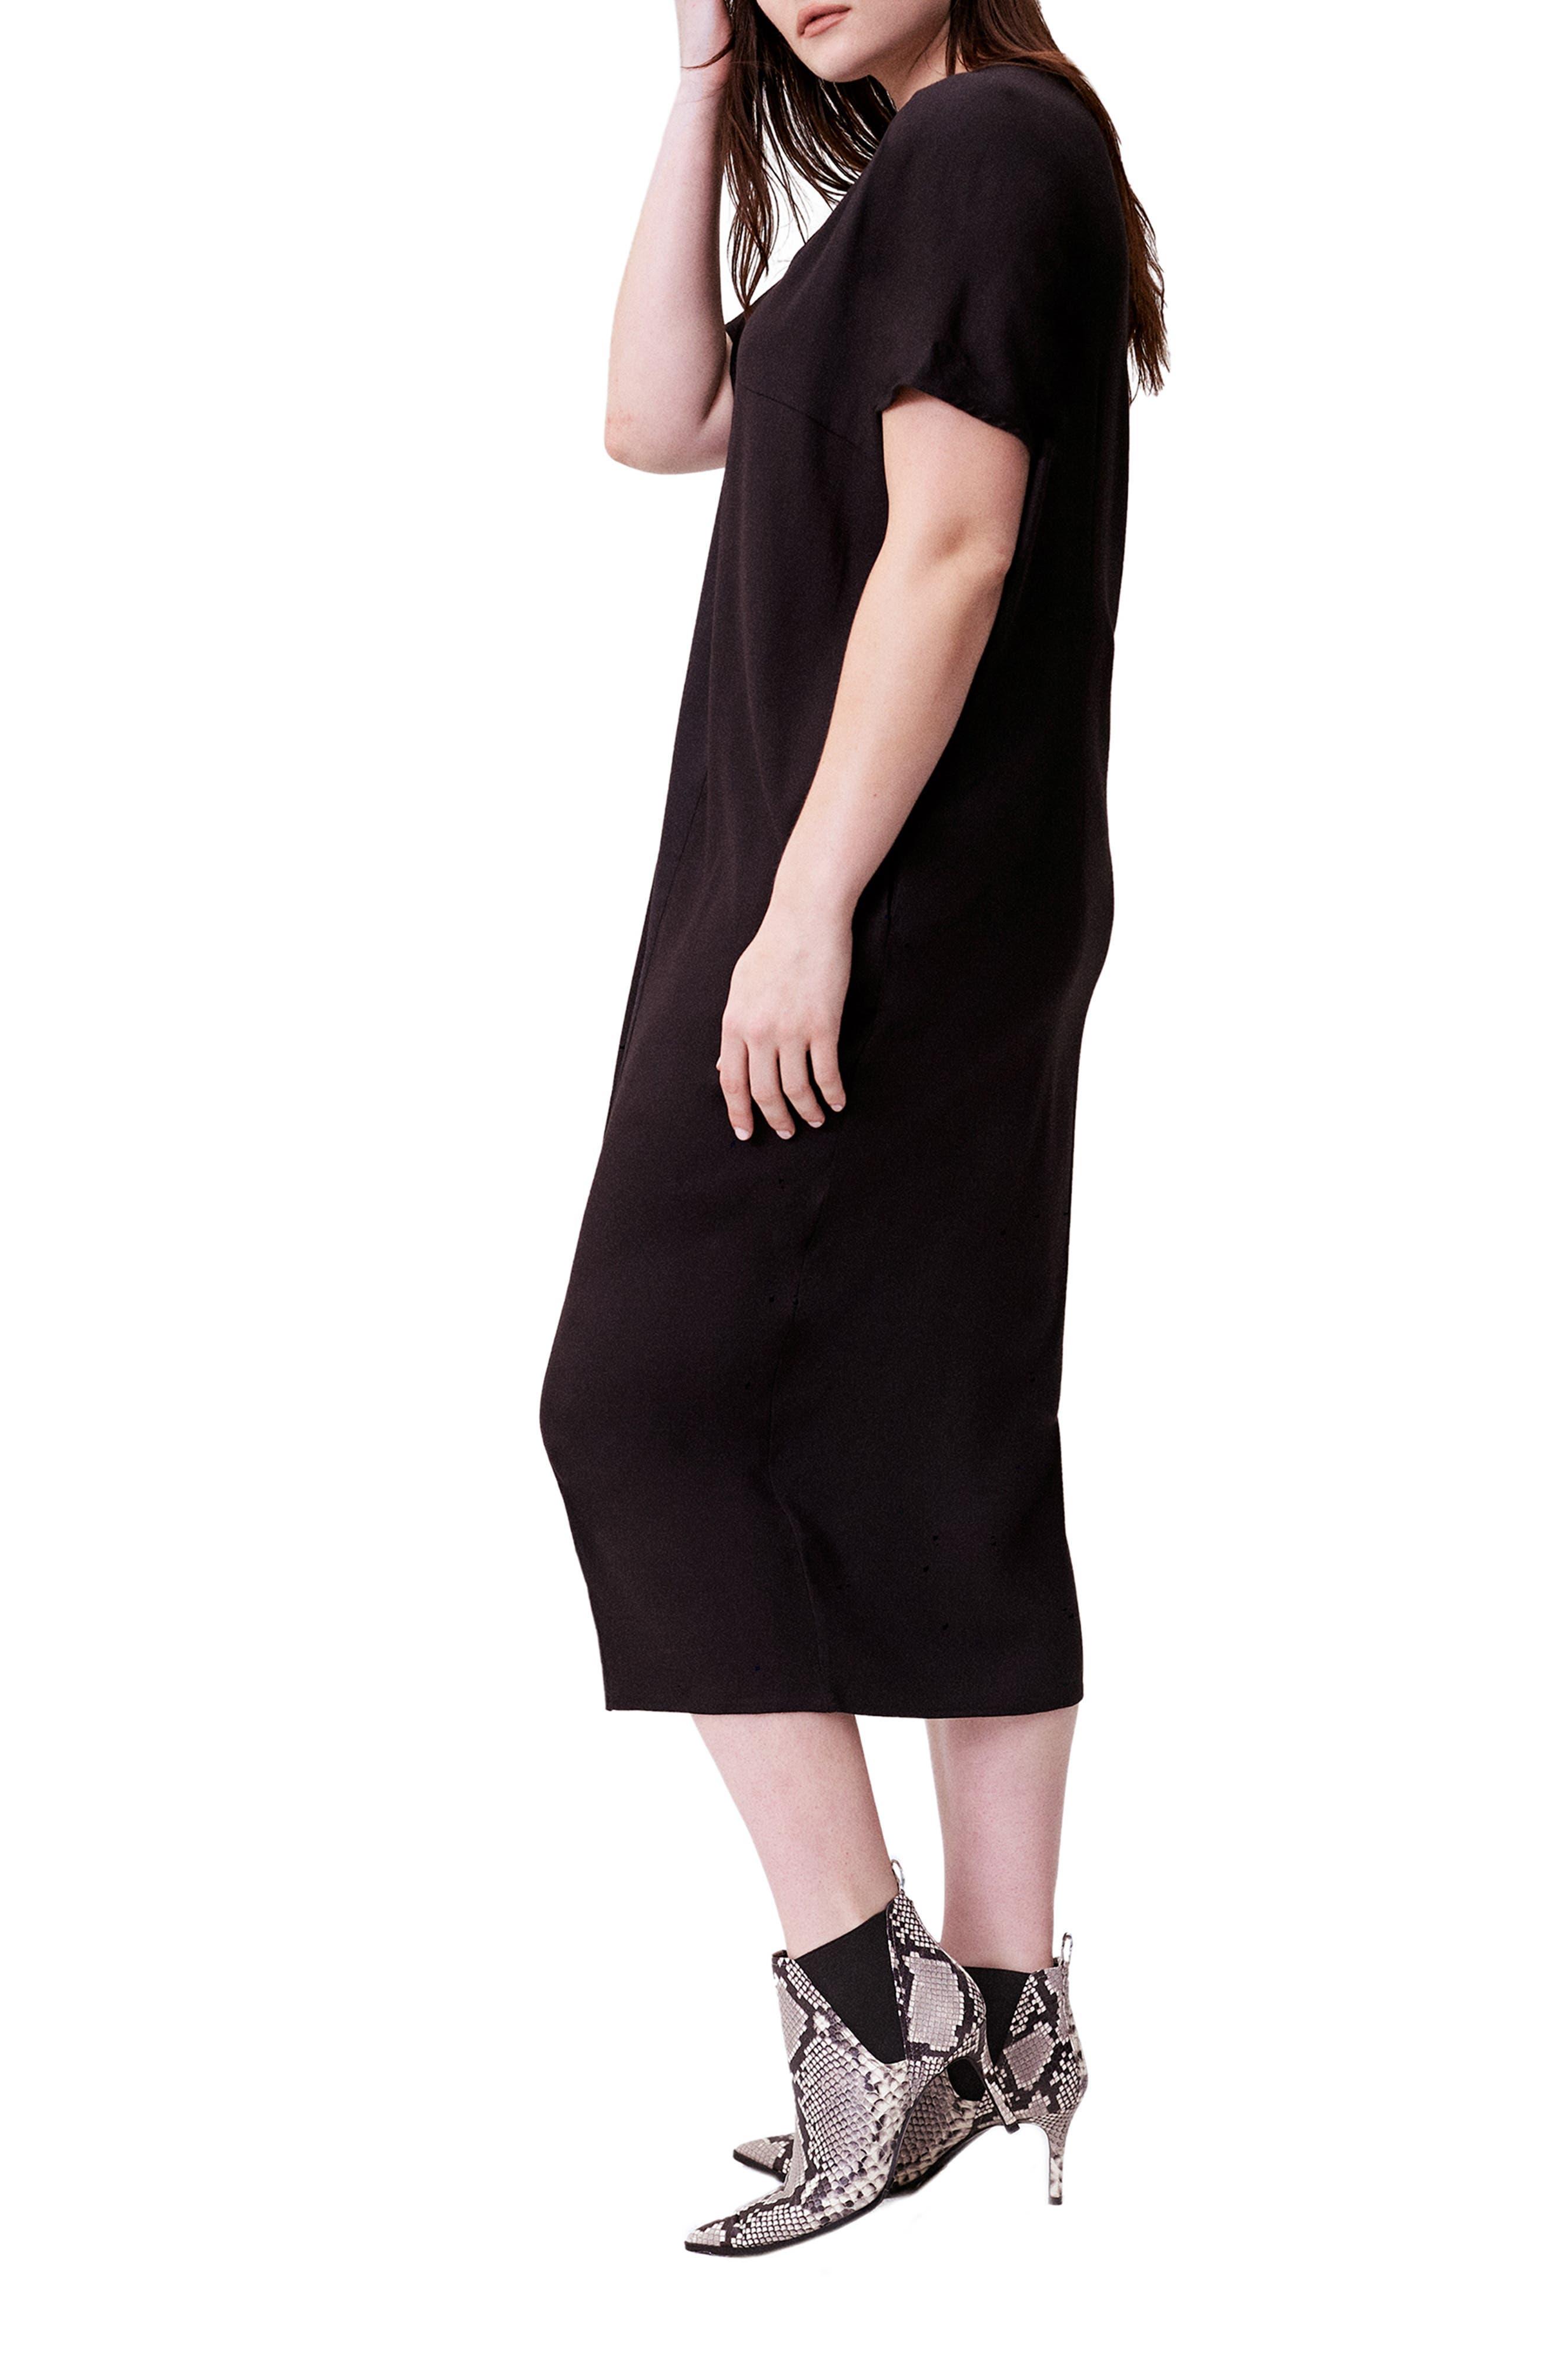 UNIVERSAL STANDARD, Crosby Caftan Dress, Alternate thumbnail 3, color, BLACK